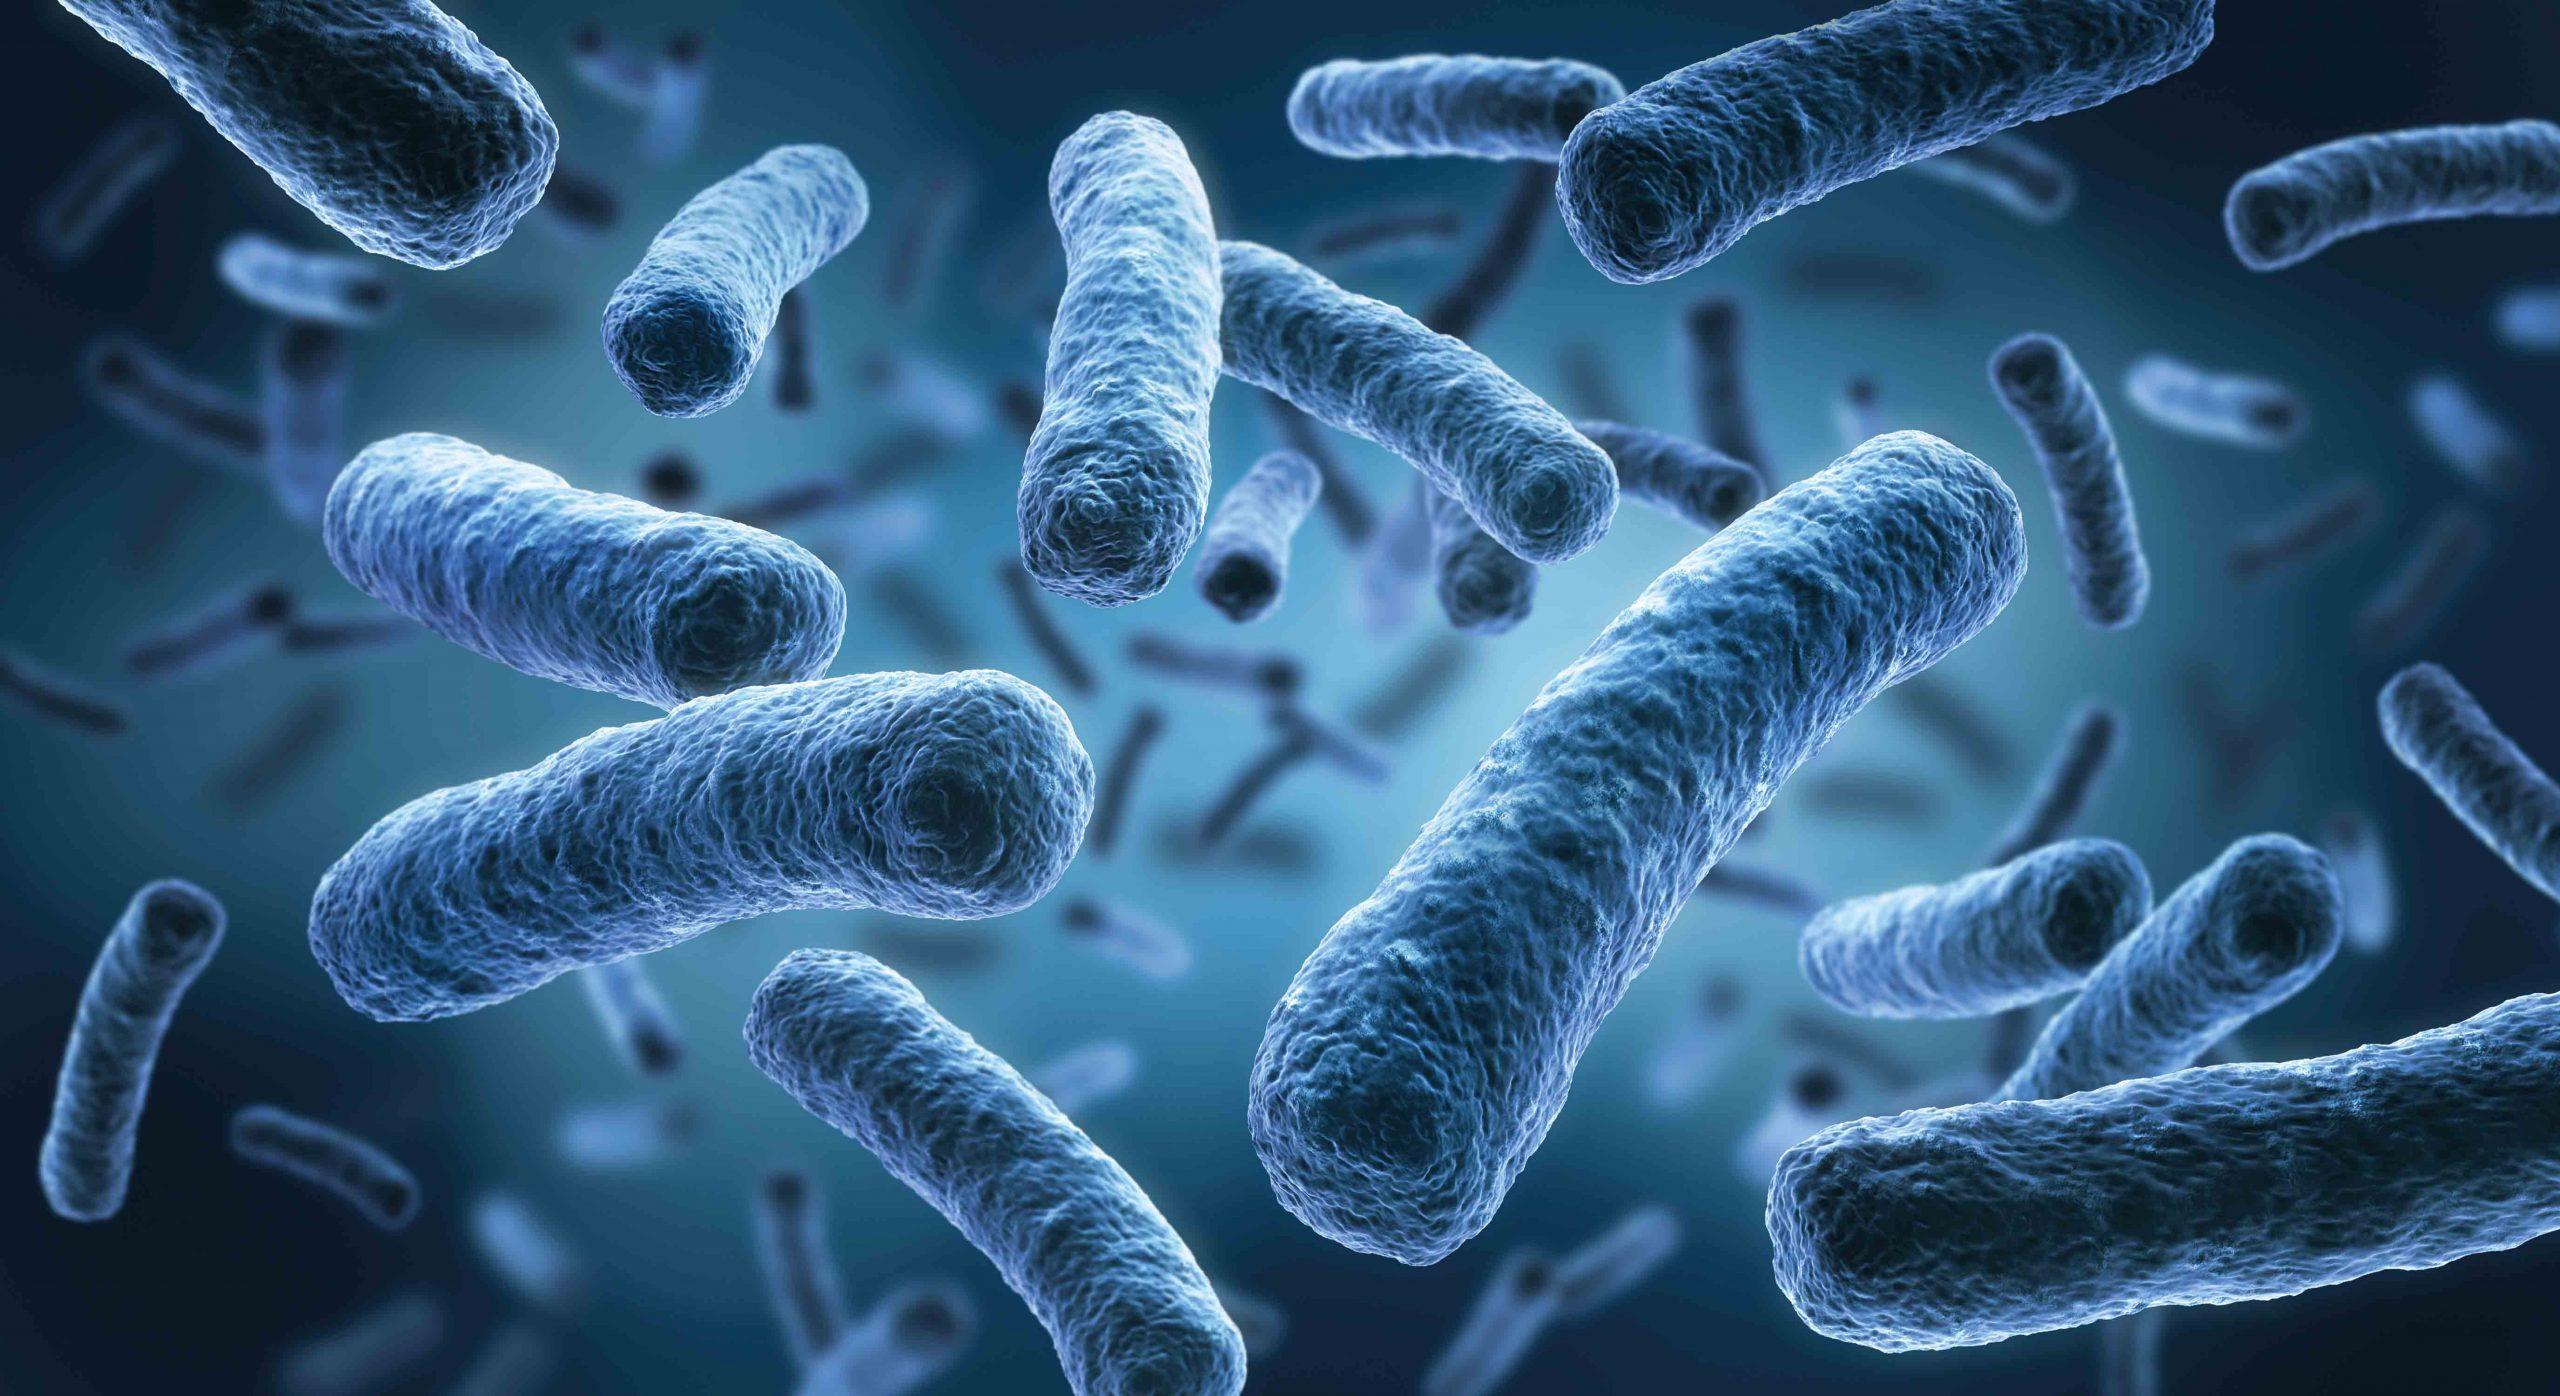 MSFM - Legionnaires' Disease #1